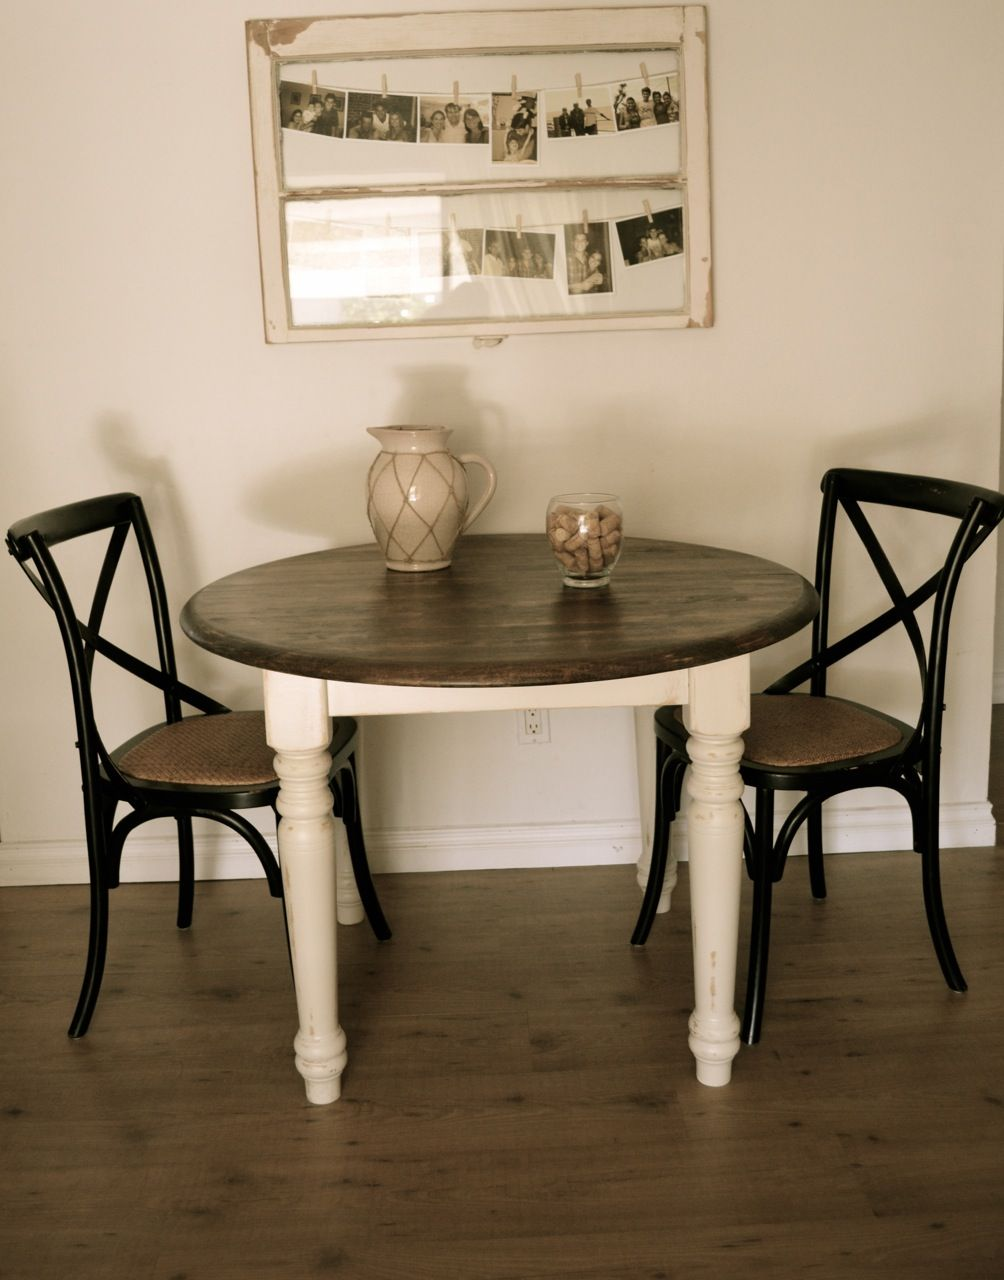 Sensational Round Dining Table Farmhouse Style Distressed Antique Download Free Architecture Designs Scobabritishbridgeorg